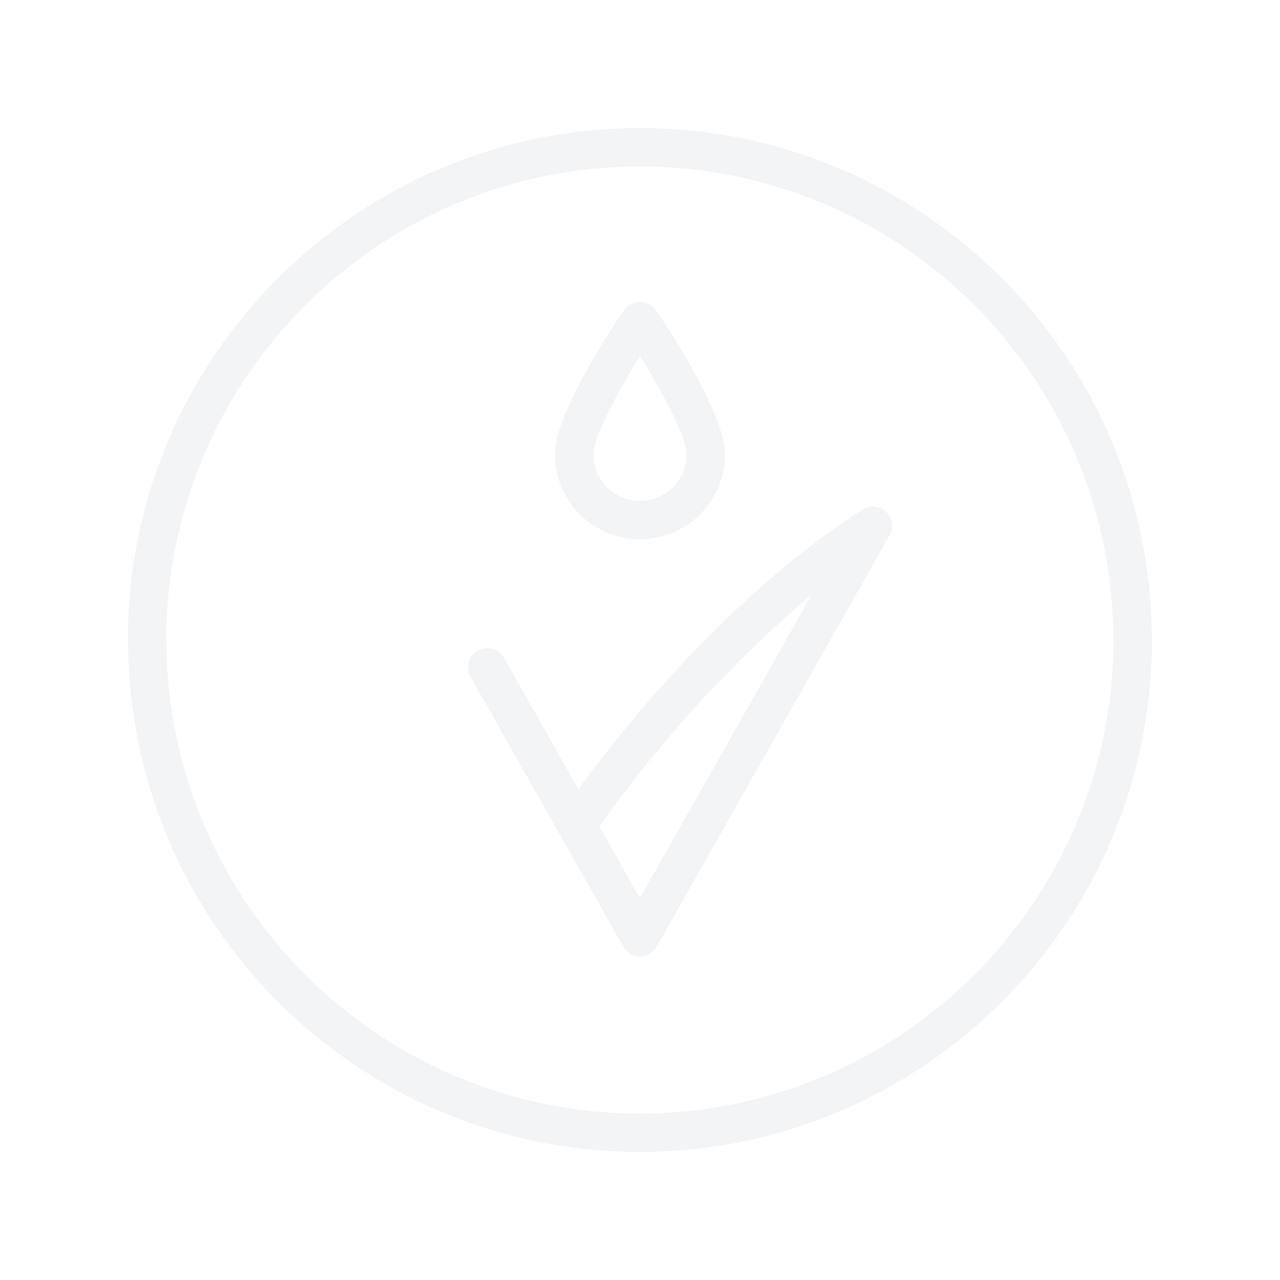 GOLDWELL Kerasilk Repower Volume Dry Shampoo 200ml